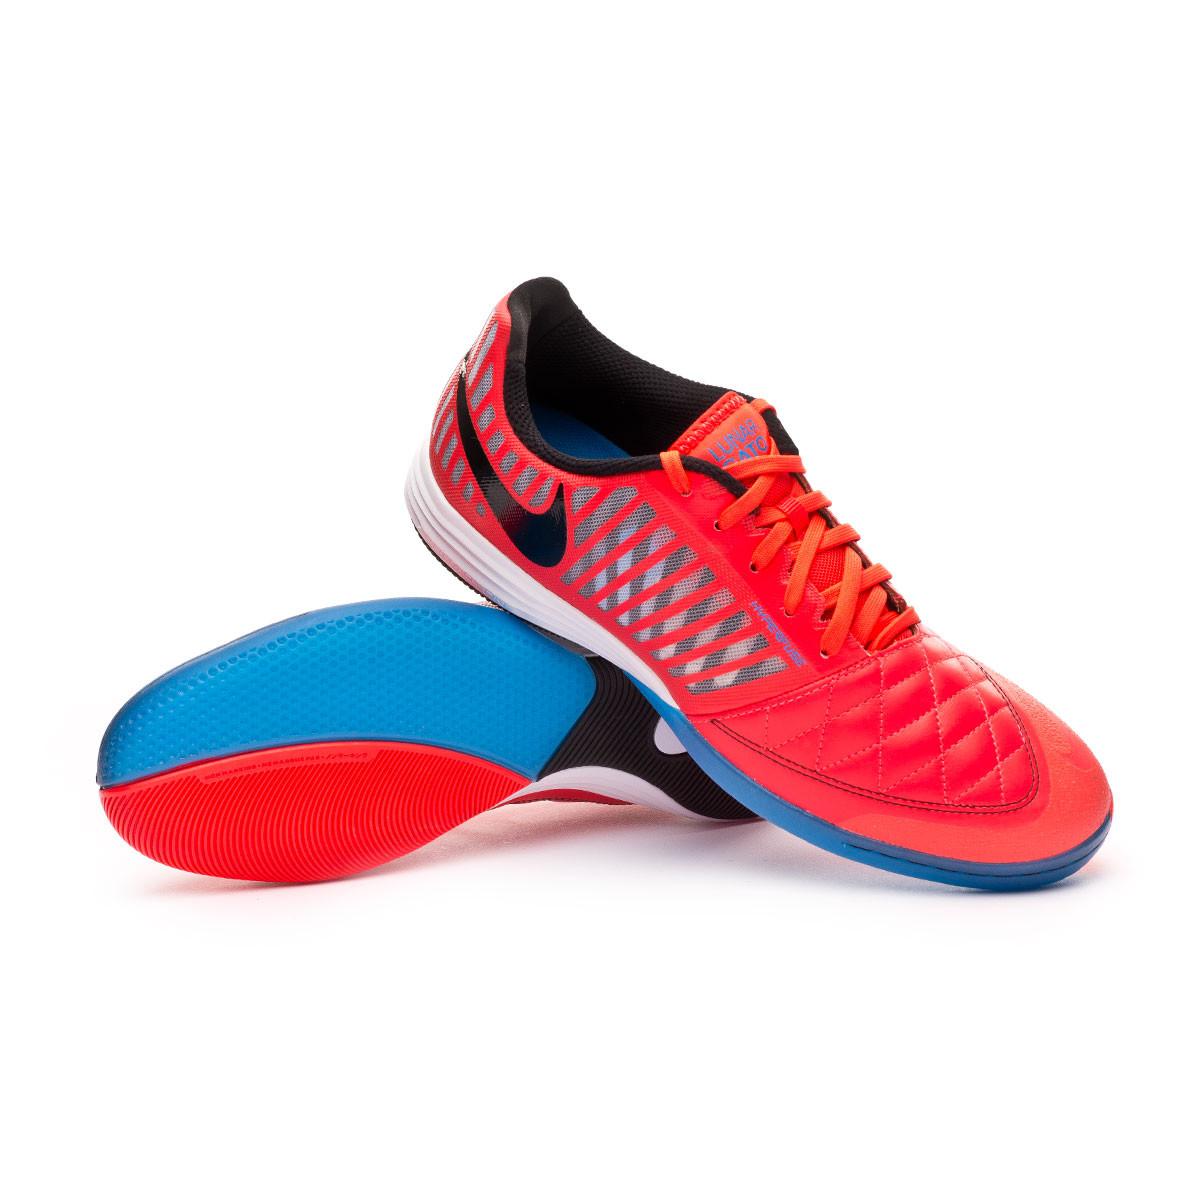 semiconductor pierna Cerveza  Futsal Boot Nike Lunar Gato II Bright crimson-Black-White-Photo blue -  Football store Fútbol Emotion